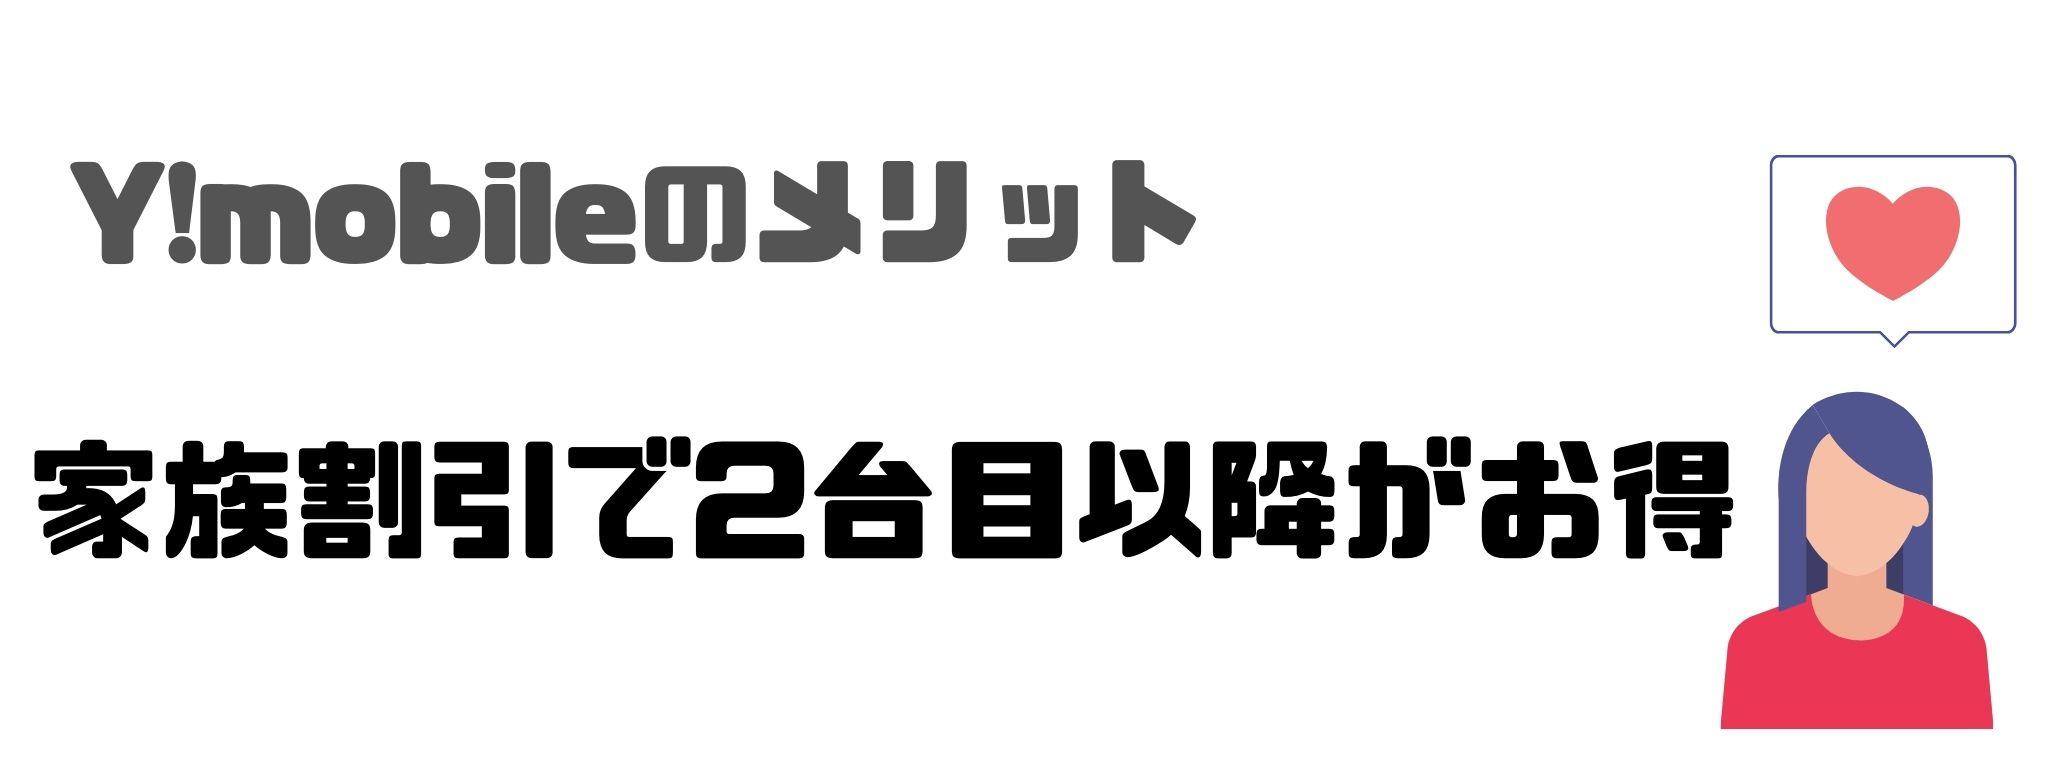 Y!mobile_ワイモバイル_口コミ_評判_家族割引_お得